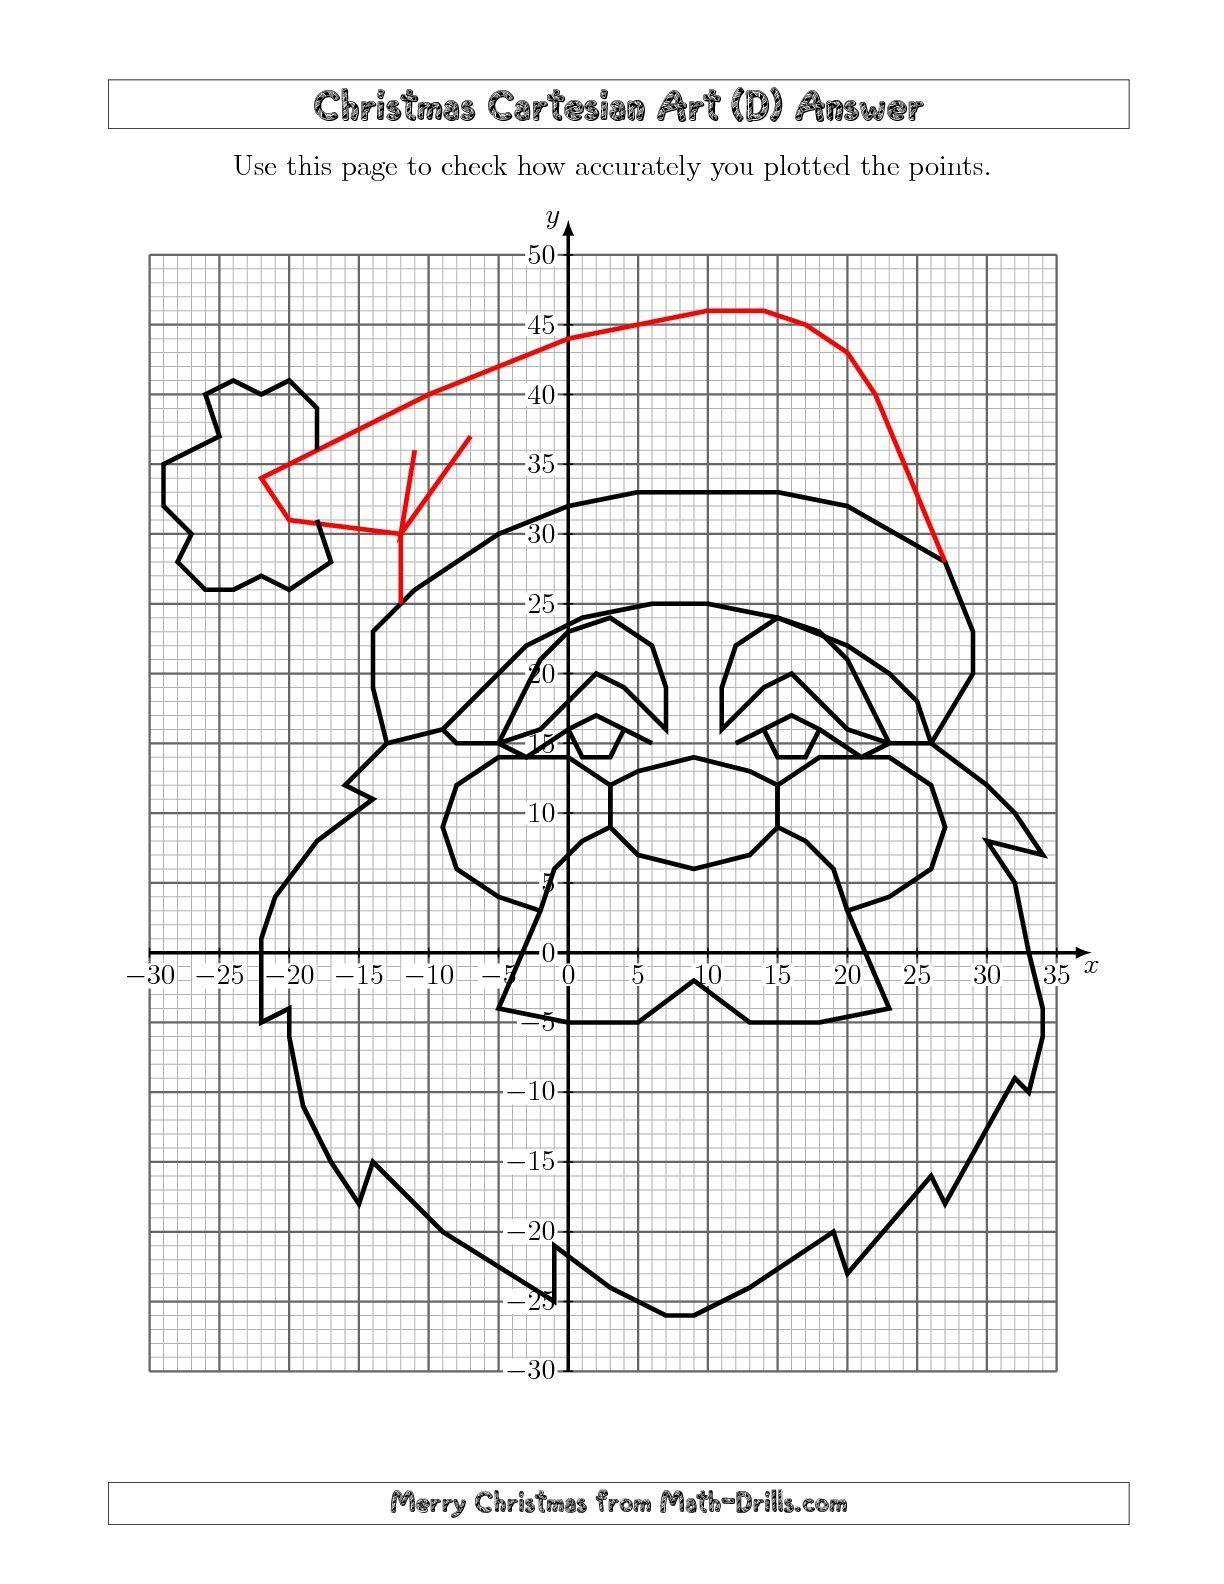 The Christmas Cartesian Art Santa (D) math worksheet from the ...